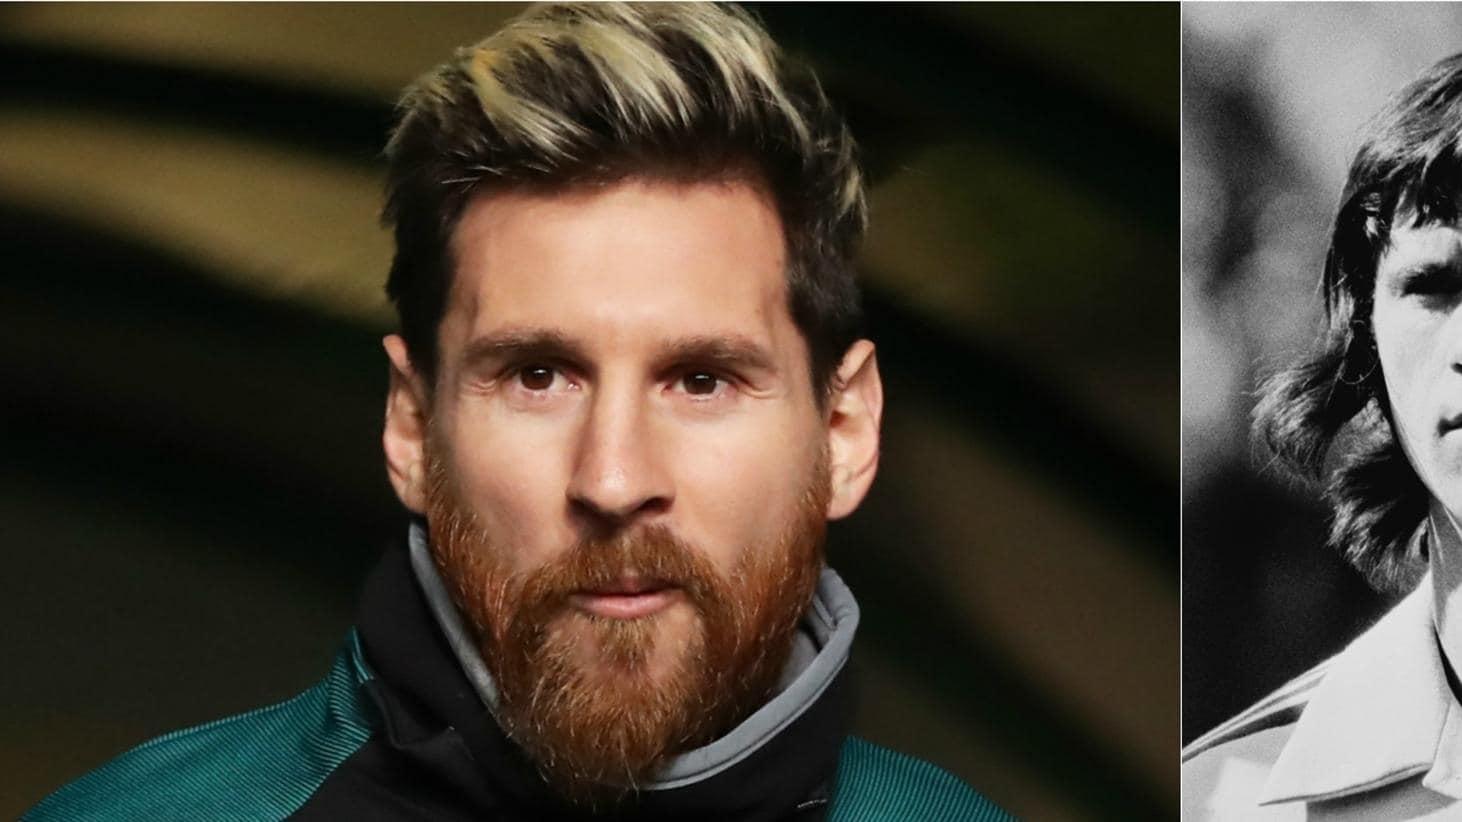 How Do Gerd Muller And Lionel Messi Compare Uefa Champions League Uefa Com